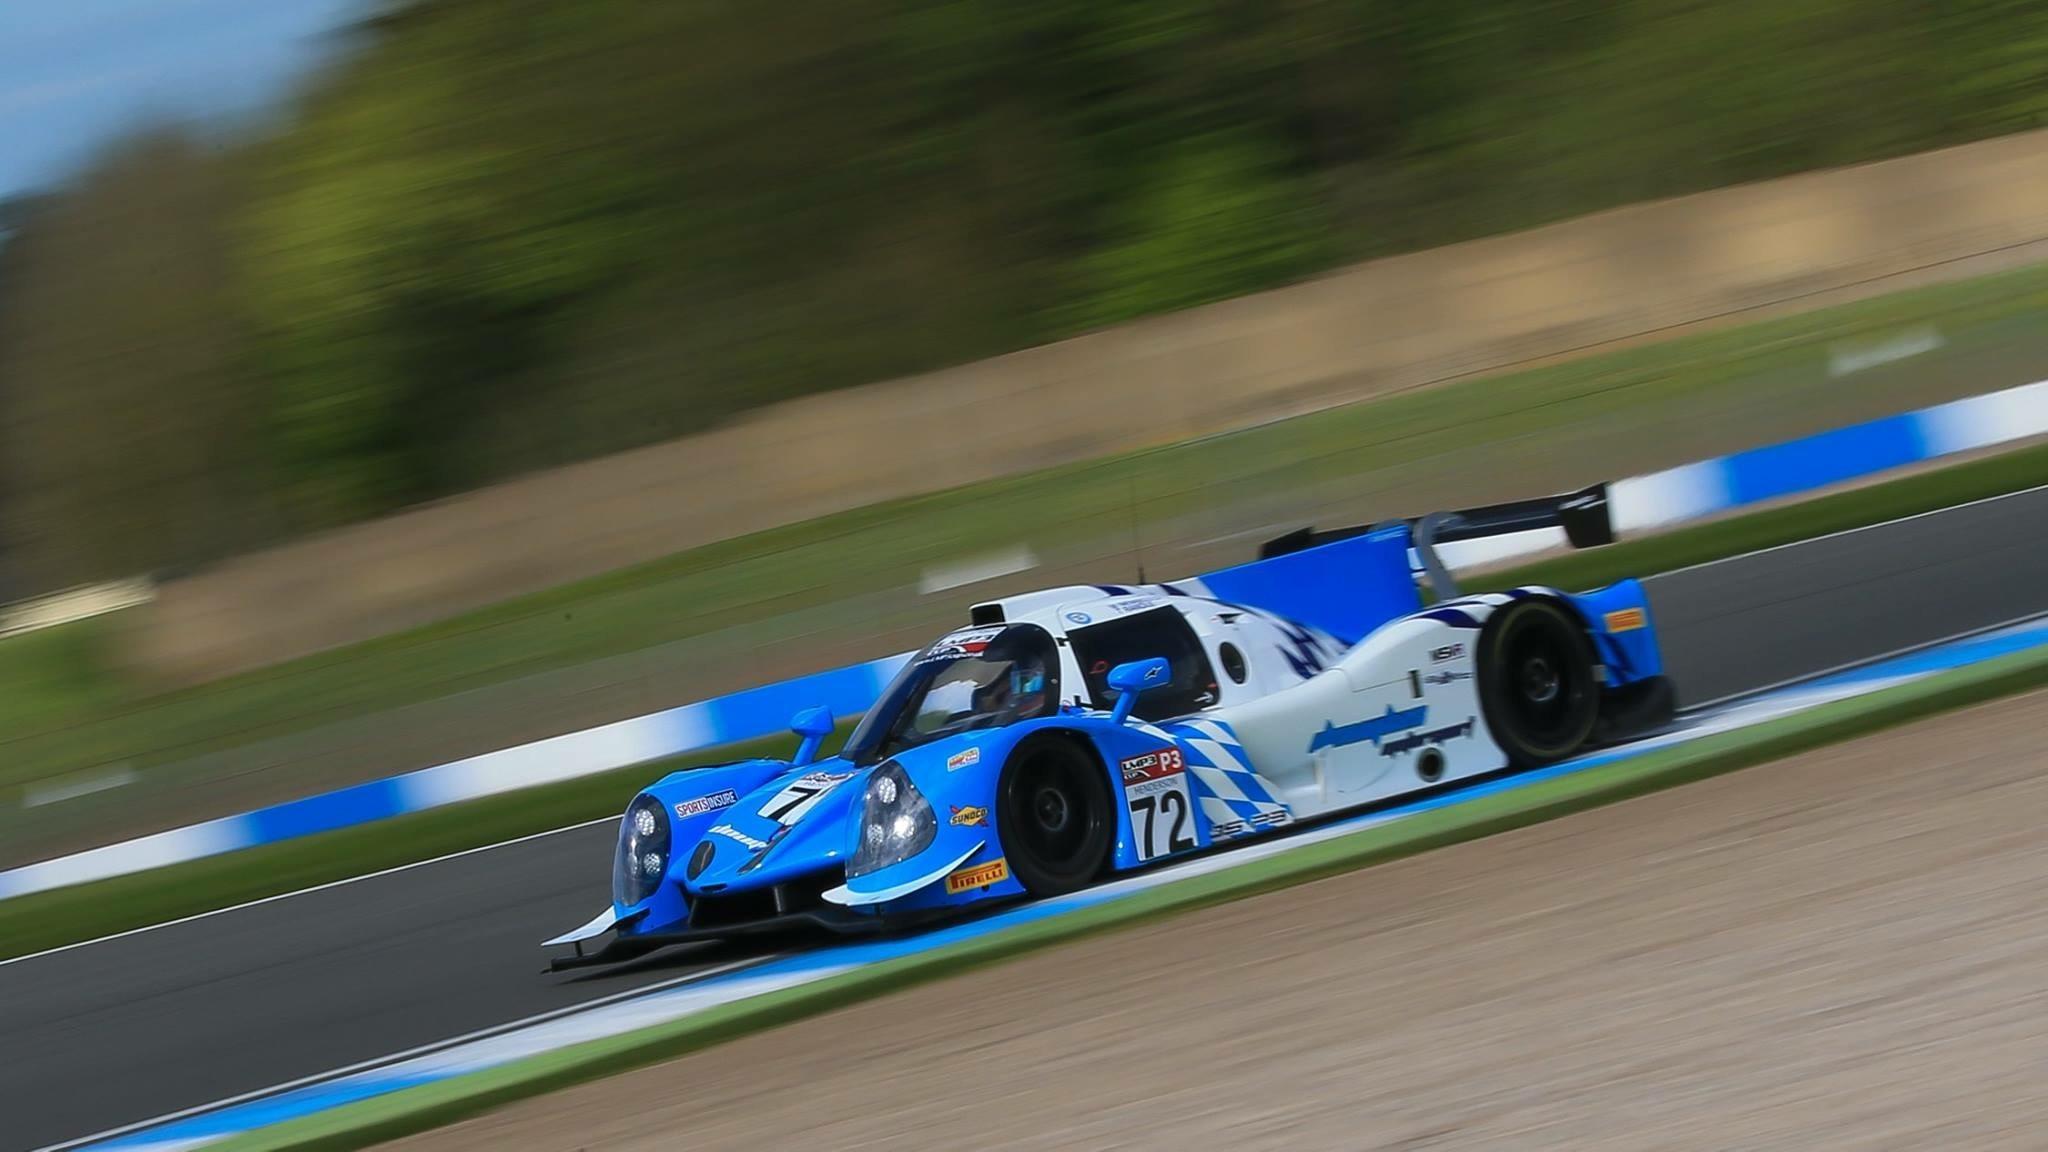 LMP3 - R1 - Donington